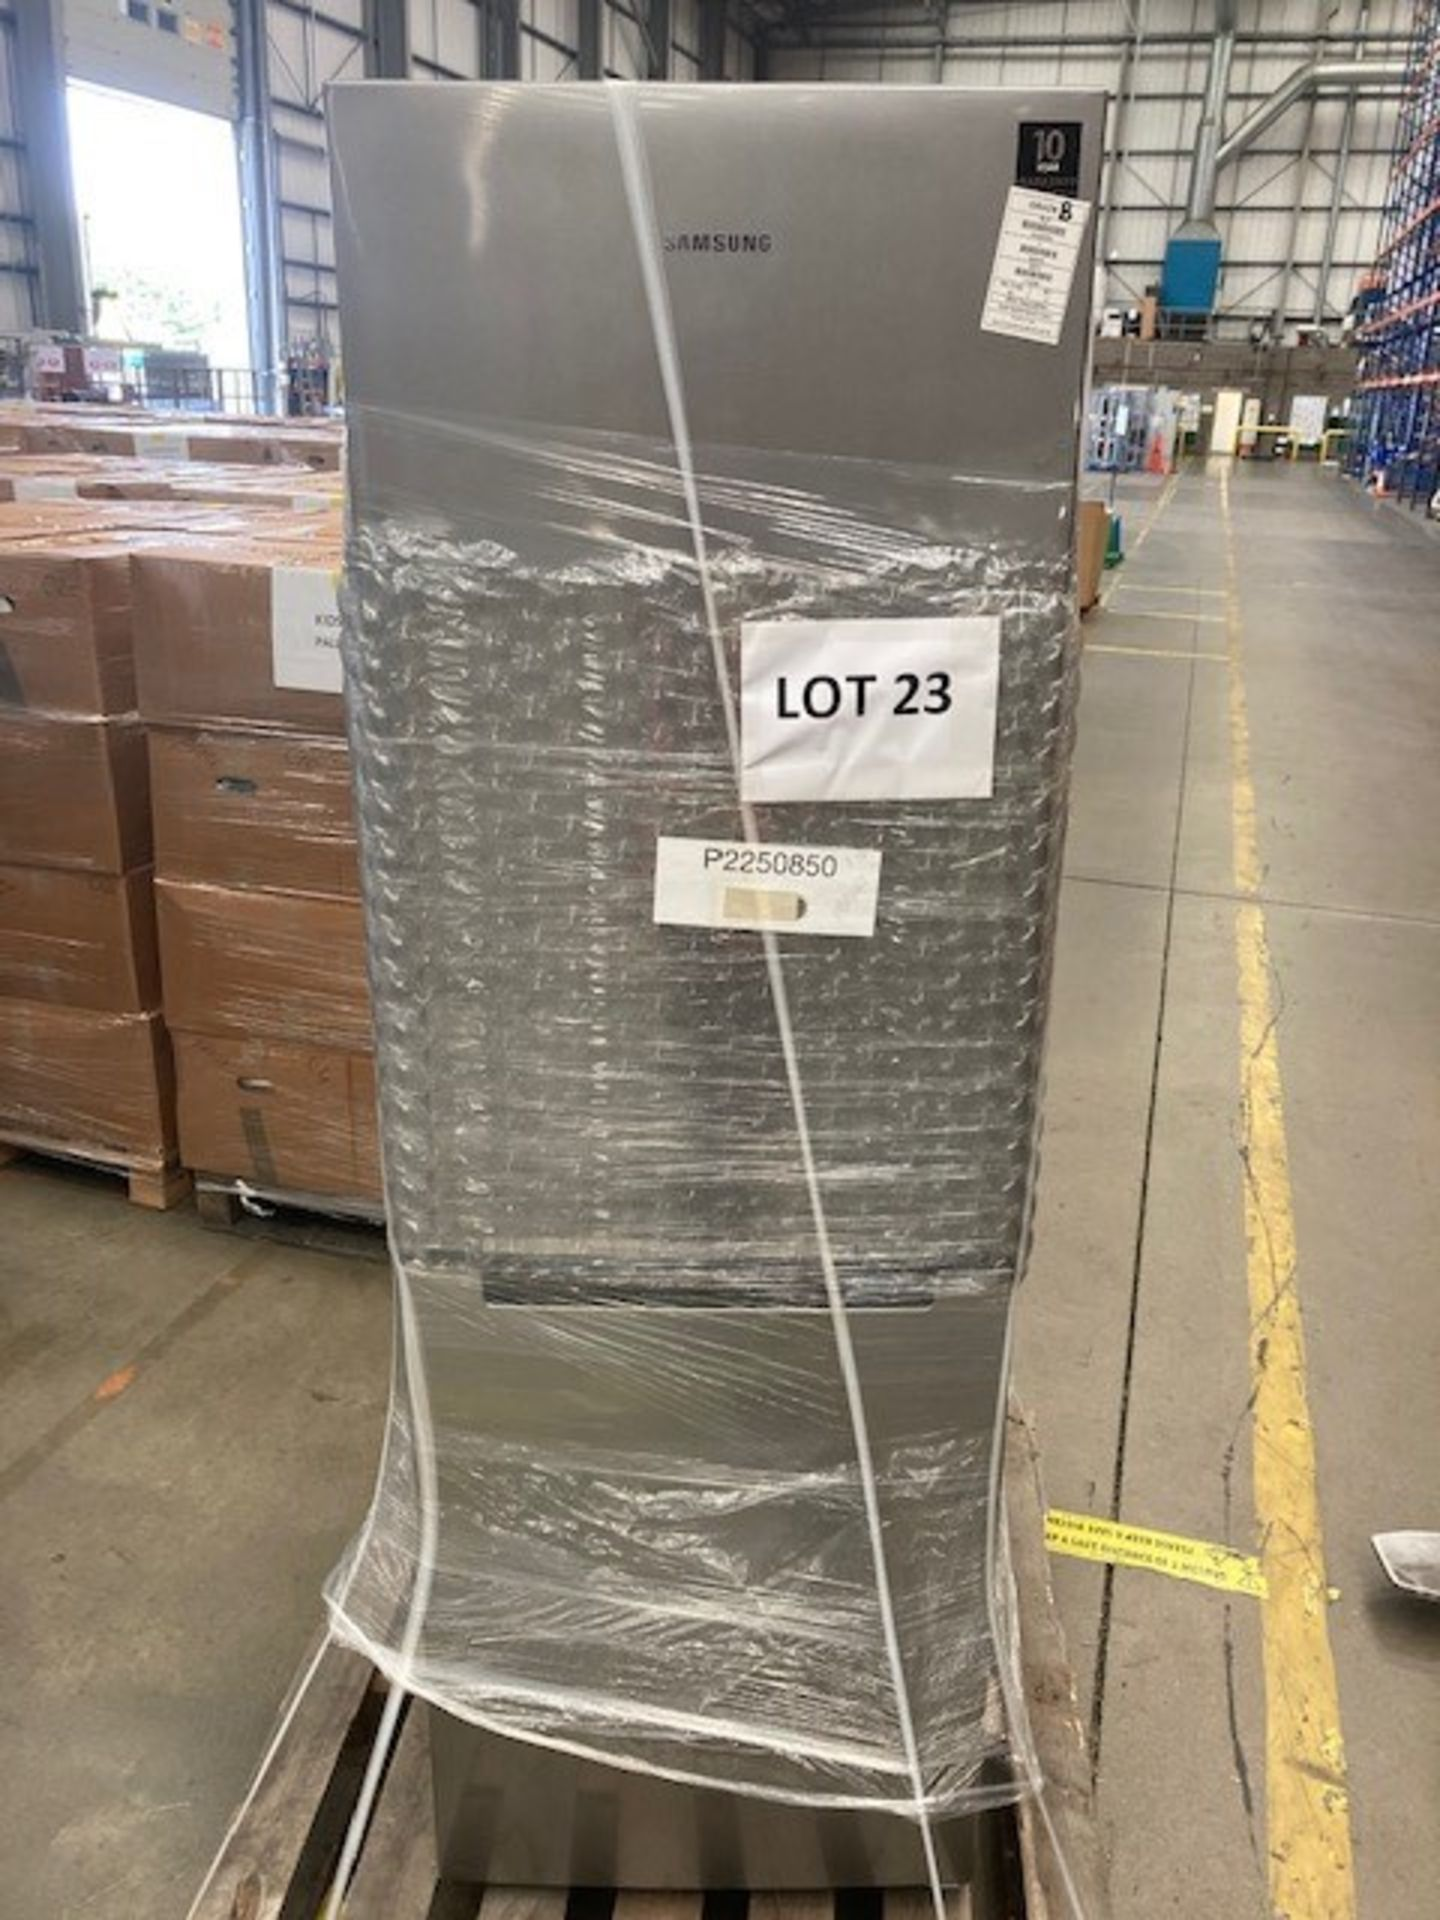 Pallet of 1 Samsung 60CM Fridge Freezer. Latest selling price £399 - Image 4 of 7